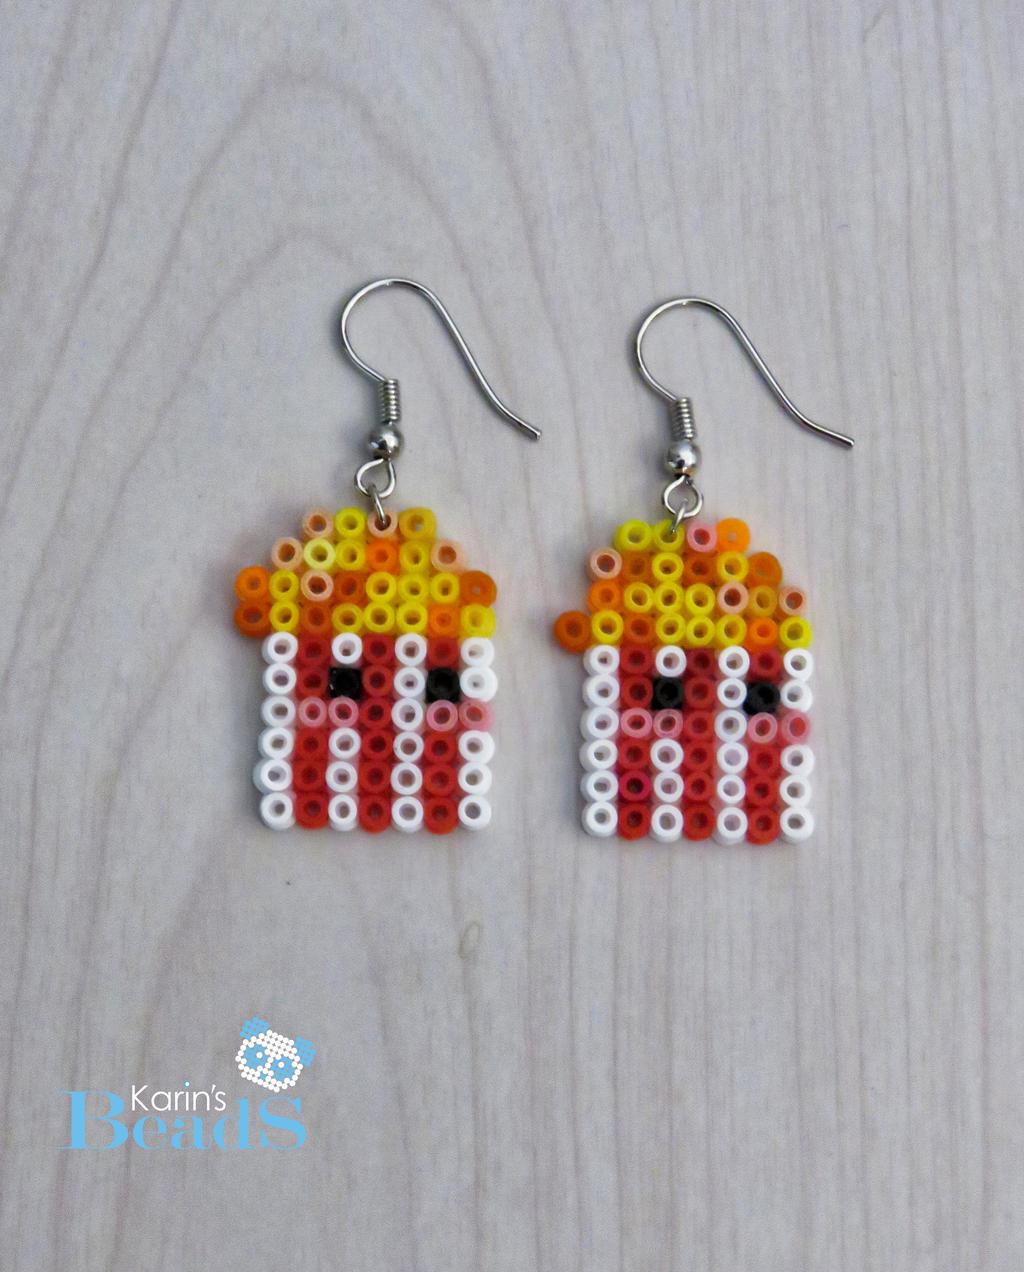 Popcorn Earrings Hama Beads By Karinmind Popcorn Earrings Hama Beads By  Karinmind